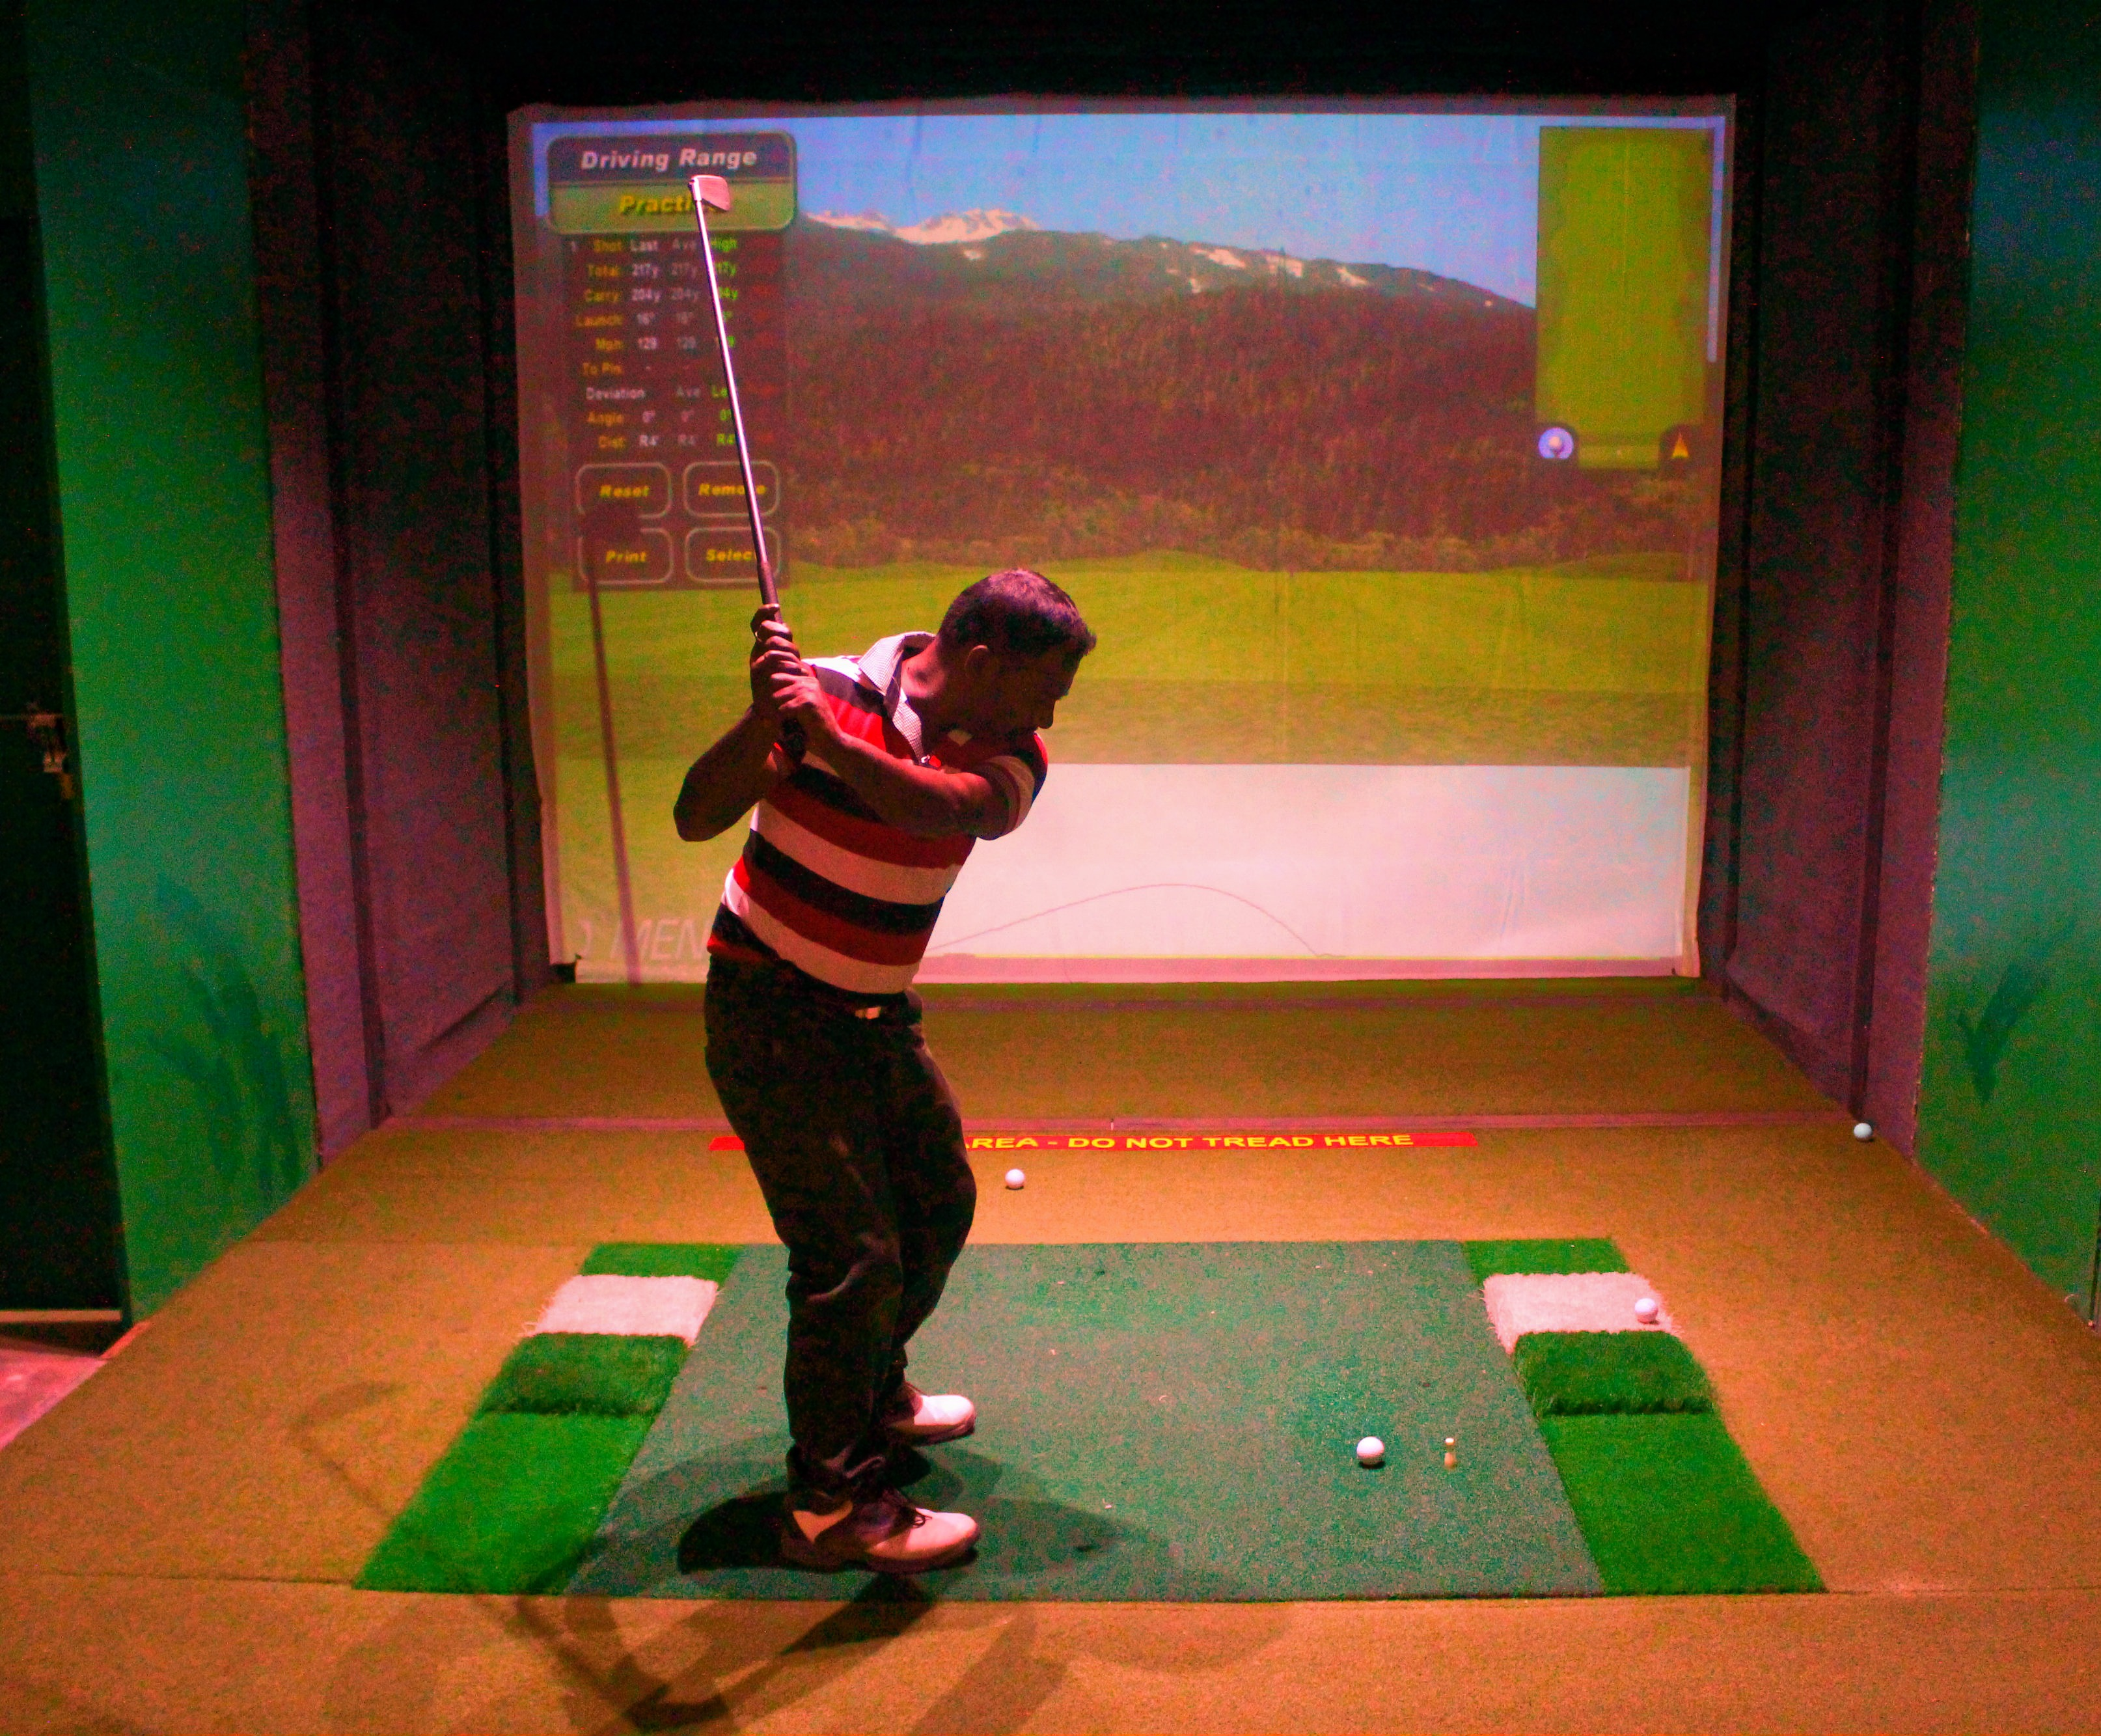 Virtual_golf_1.jpg